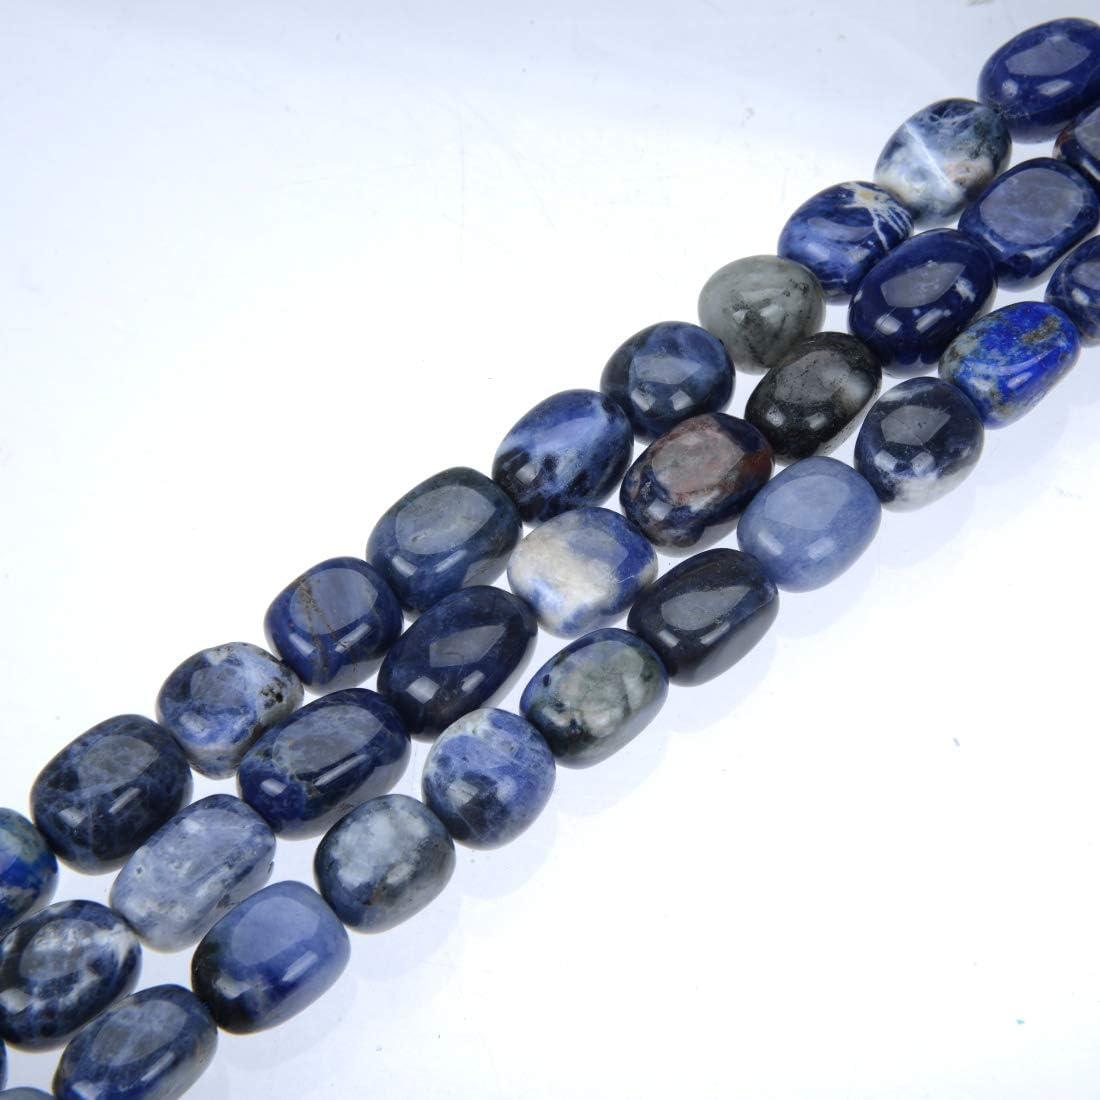 Sodalite 10mm Natural Gemstone Round Beads 15 Inch Loose